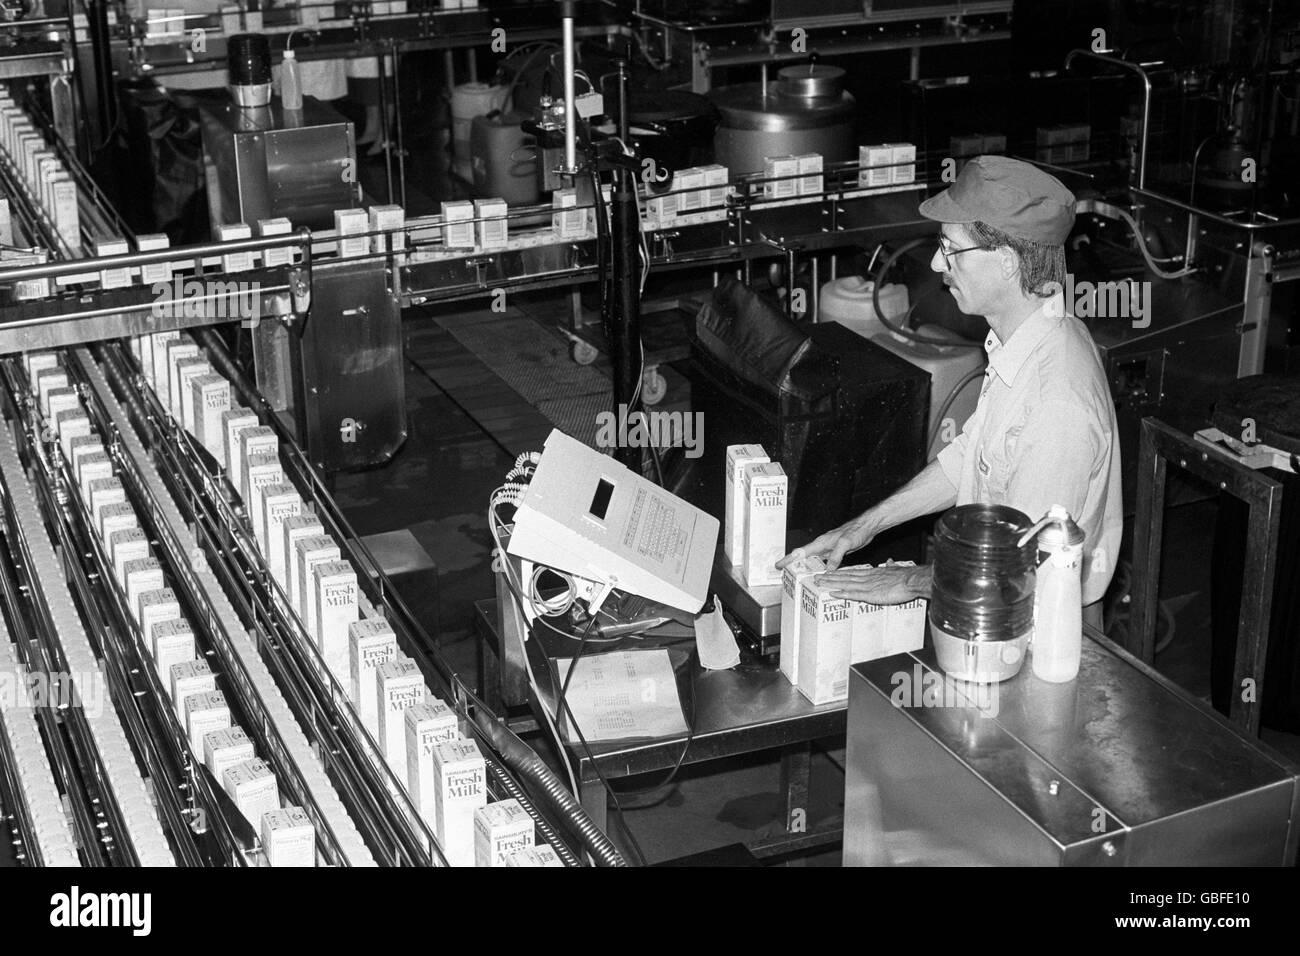 British Industry - Dairy - London - 1987 - Stock Image